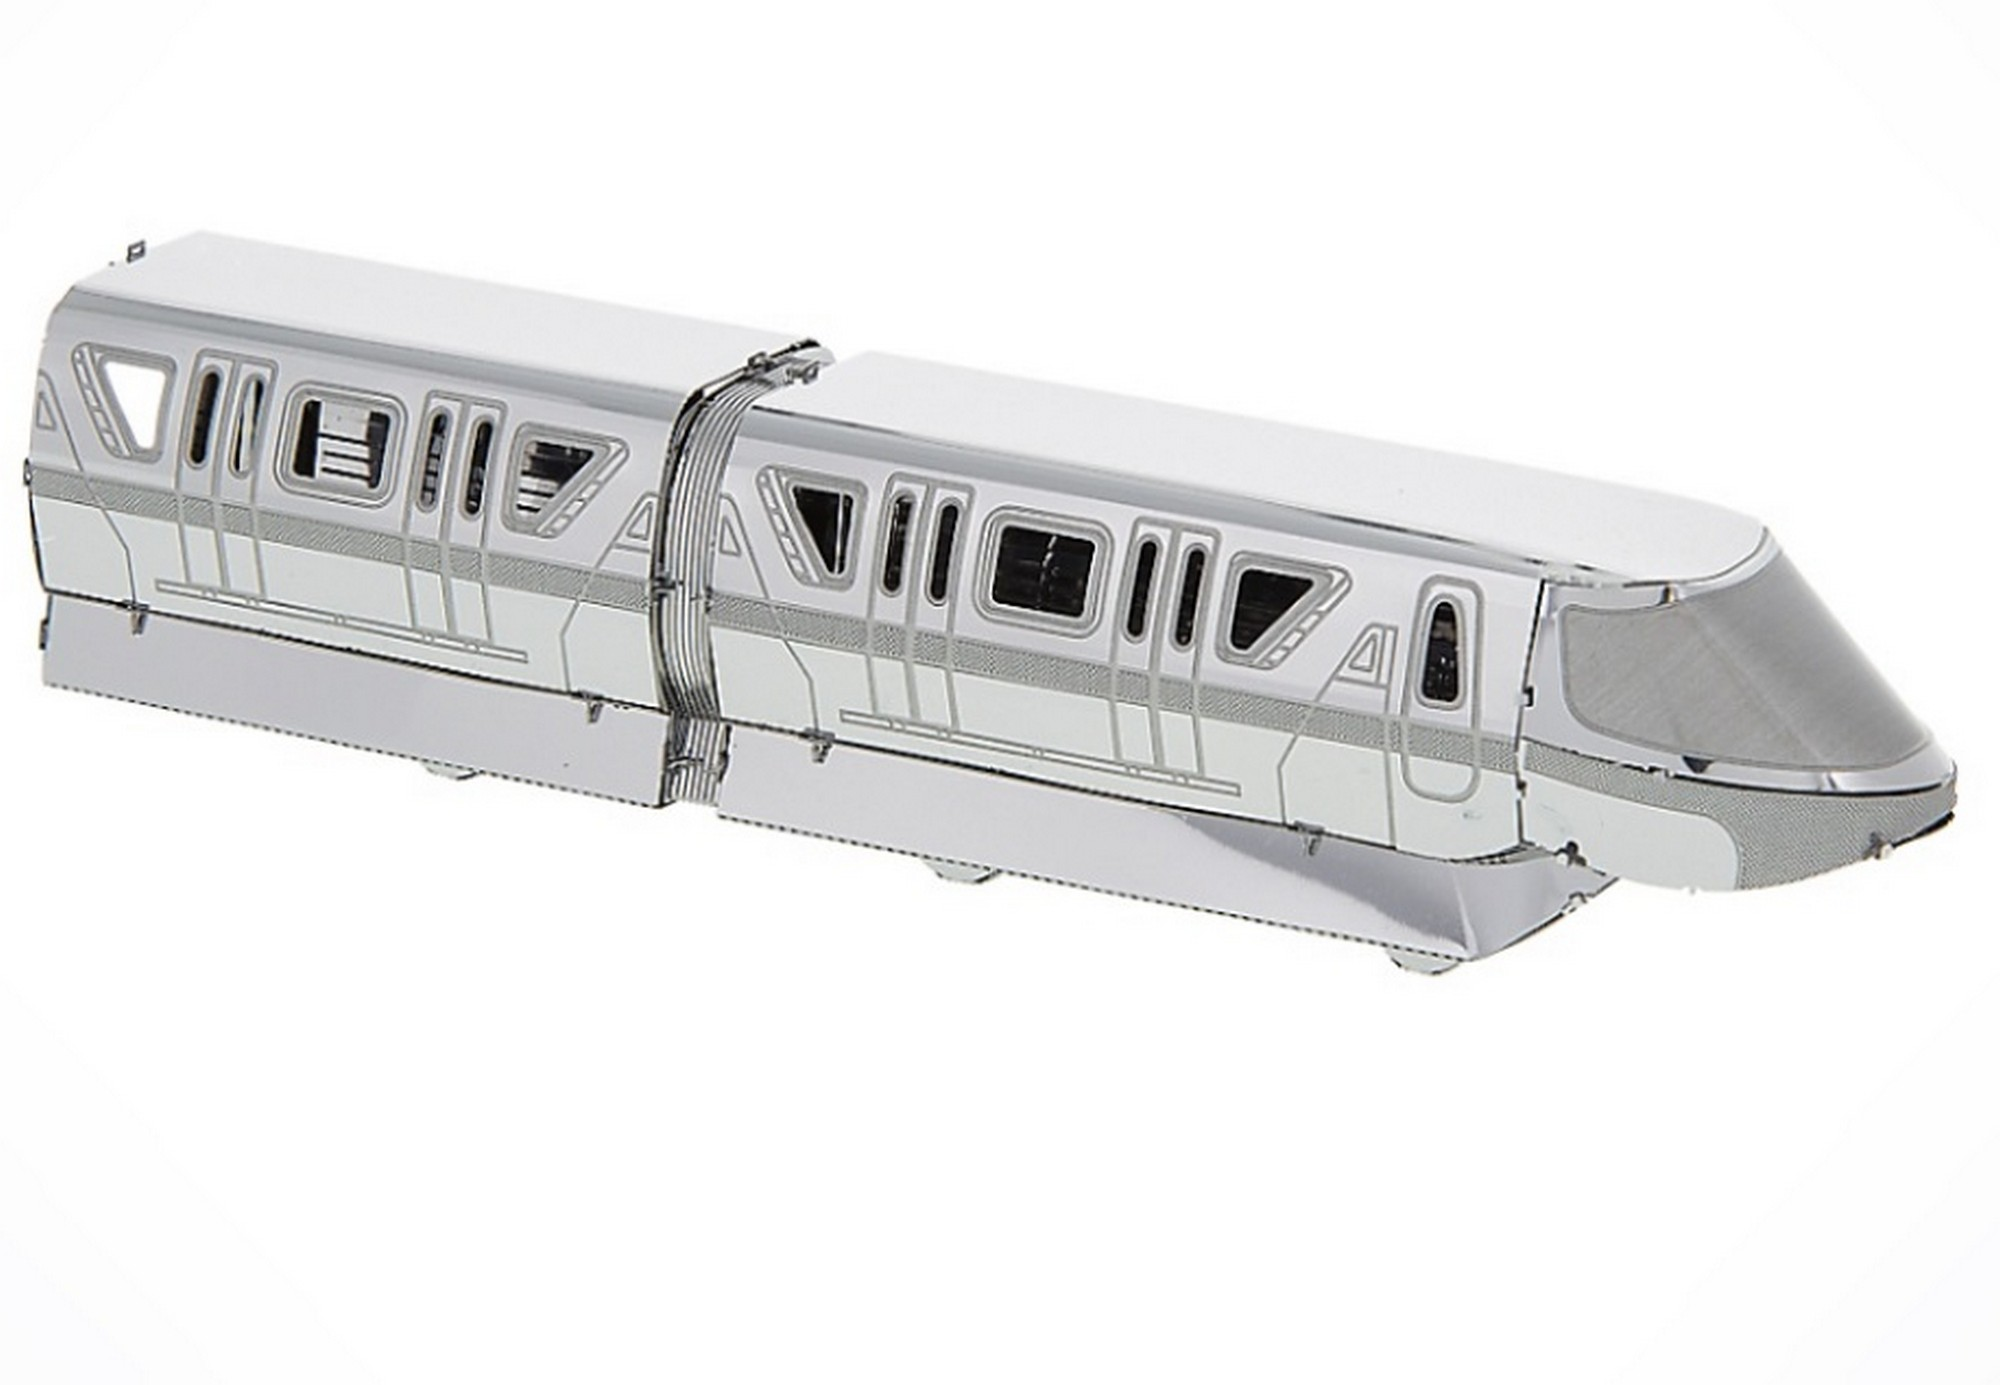 Walt Disney World Monorail 3D Metal Model Kit - Disney Exclusive © Dizdude.com